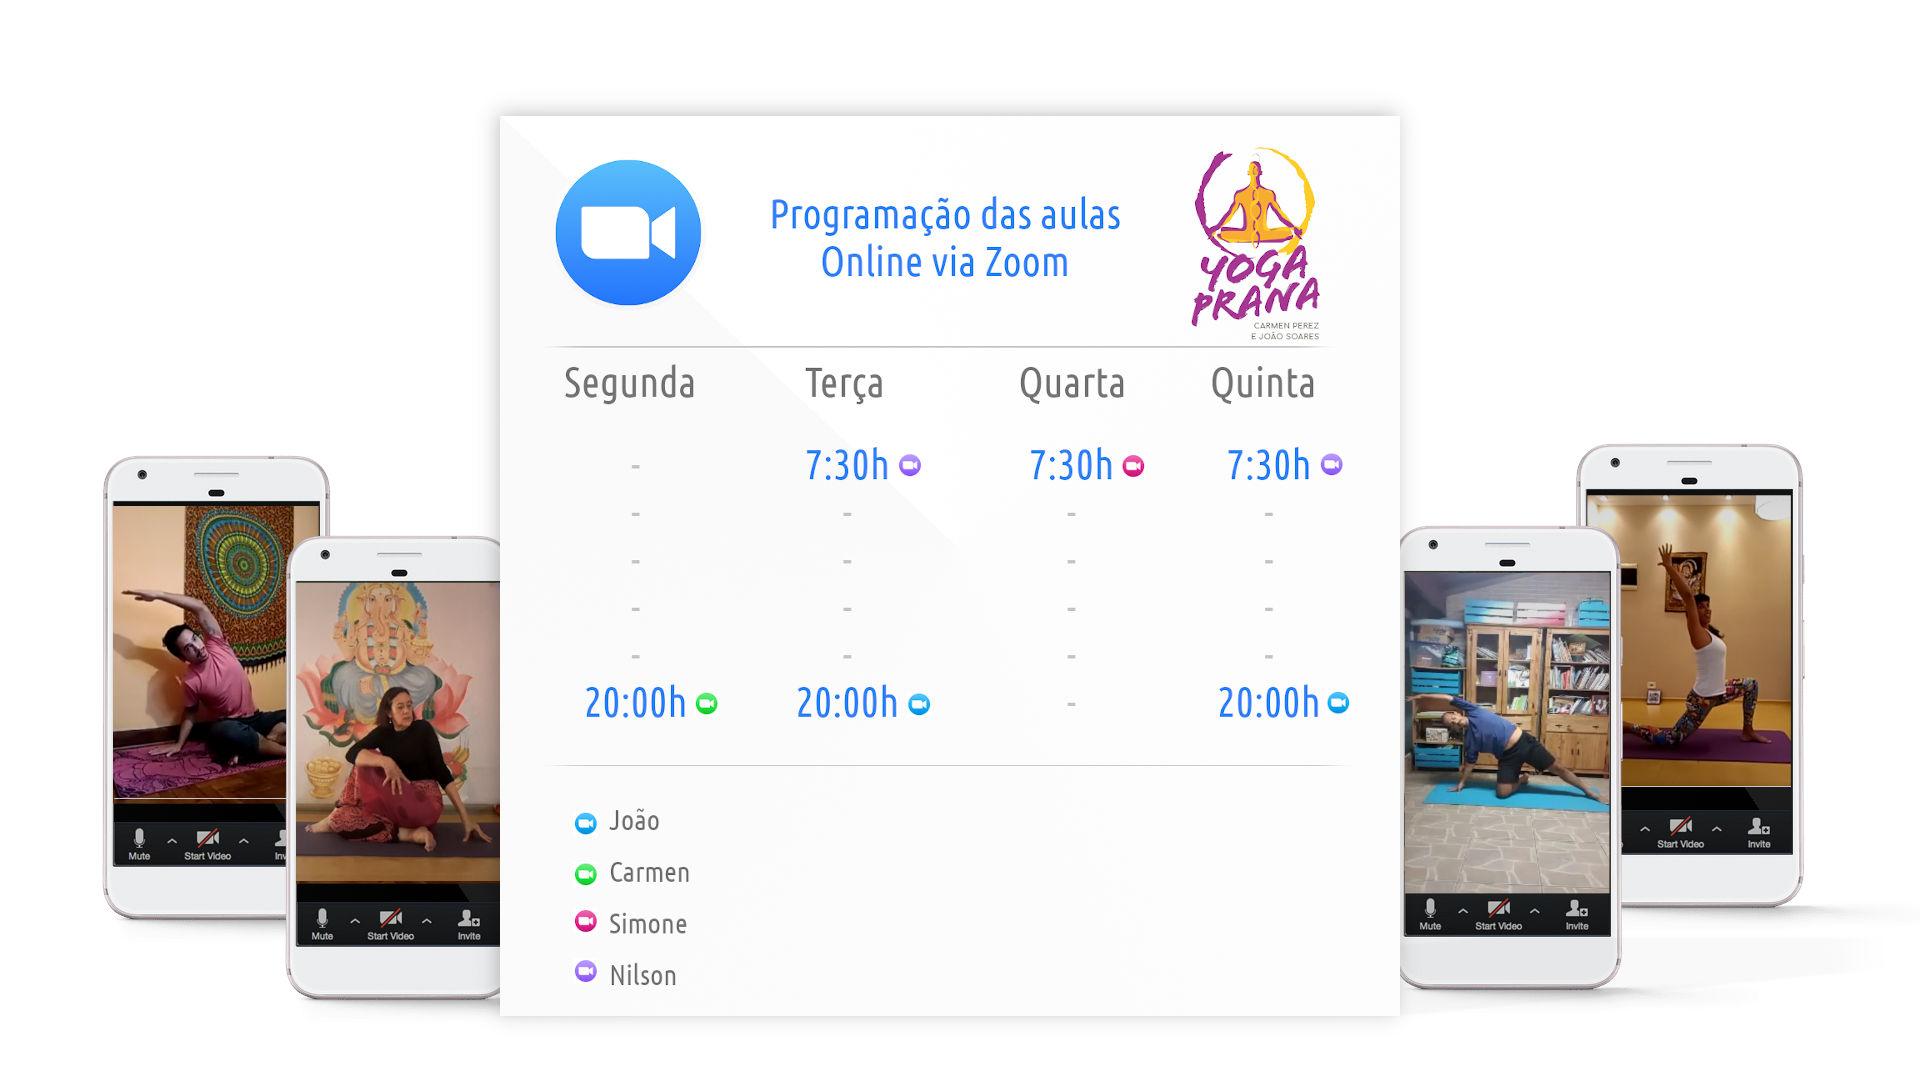 aulas-yogaprana-zoom-horario